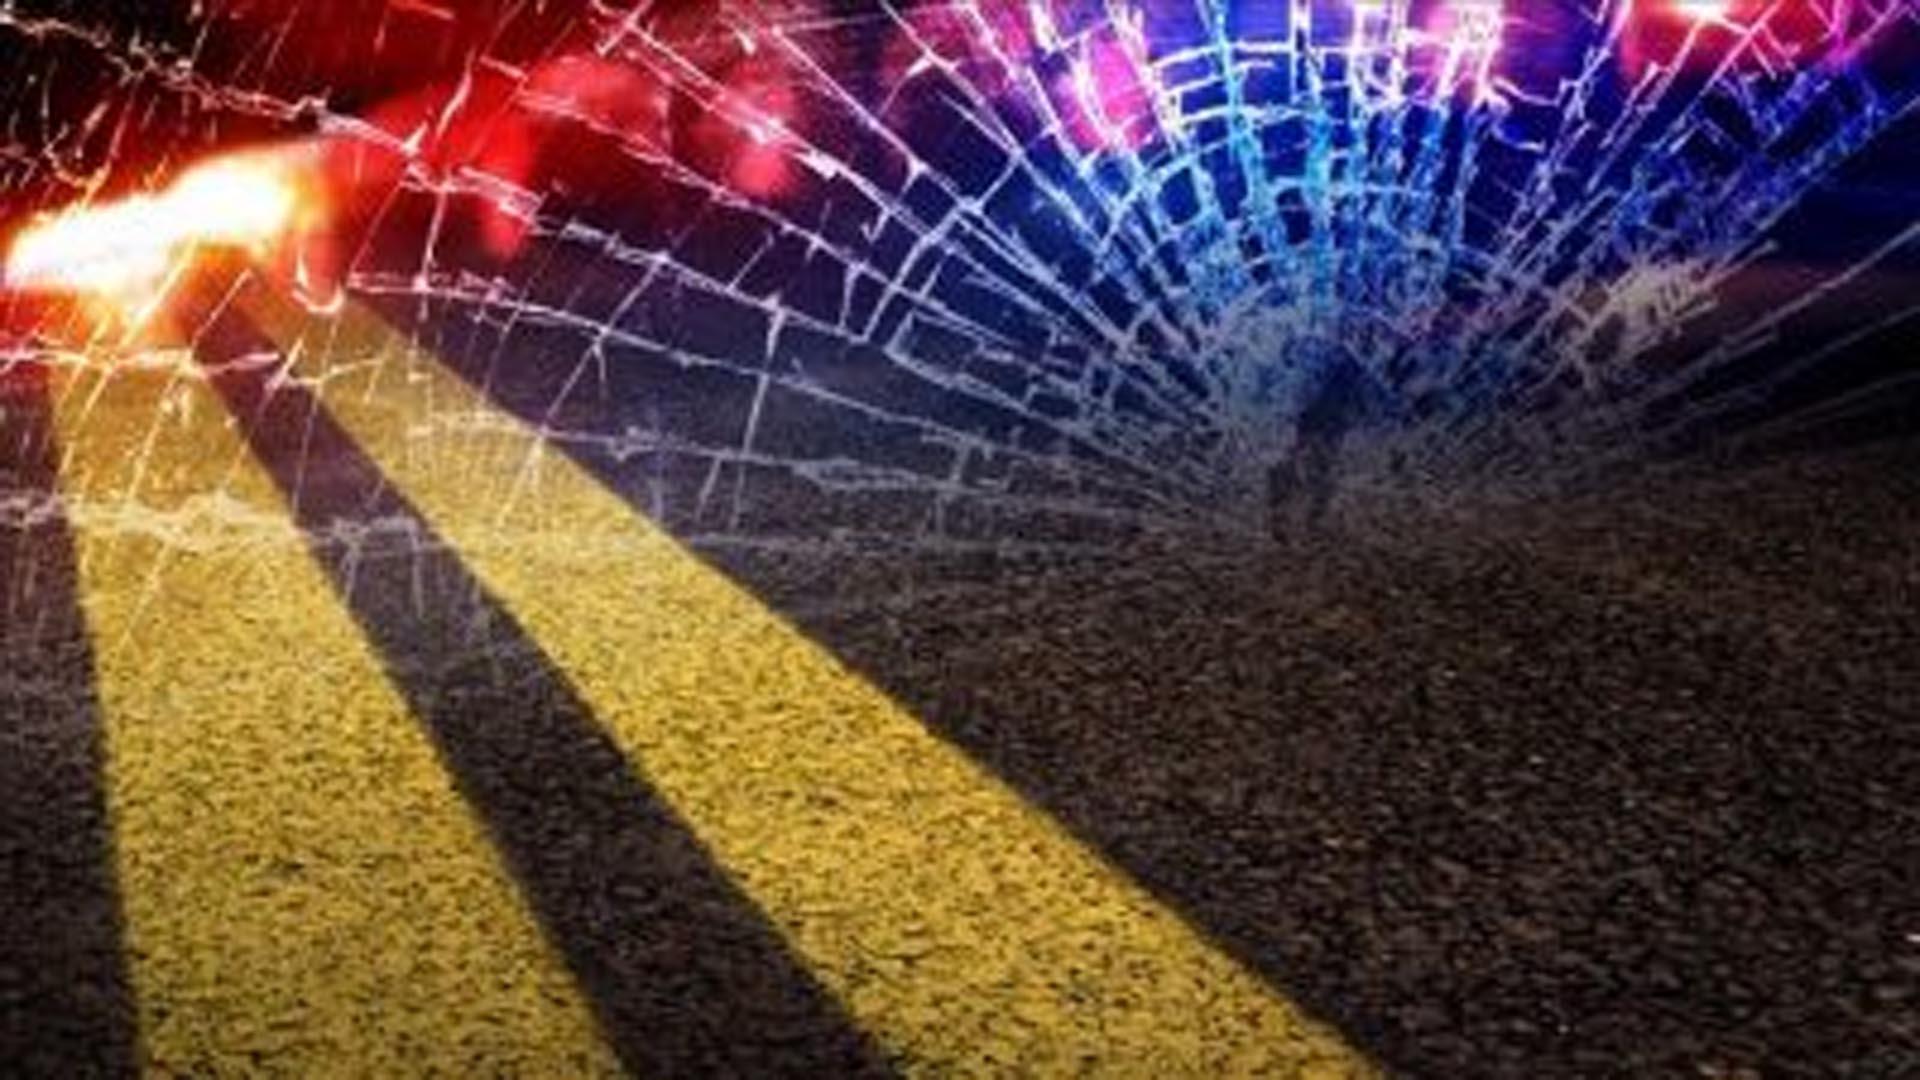 Man killed in head-on crash north of Lakeview - KOBI-TV NBC5